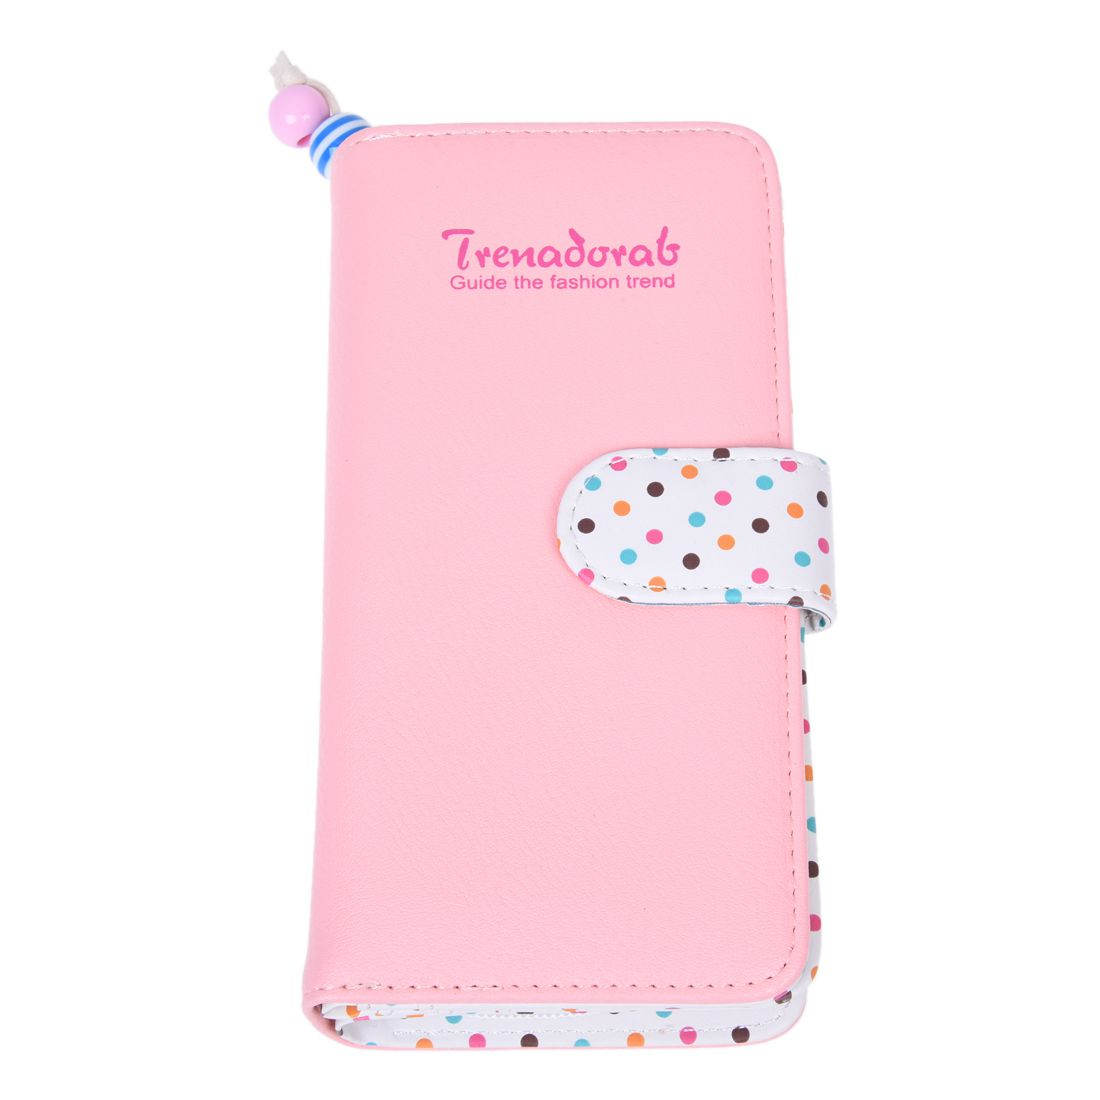 где купить HEBA Hot Sale Women's wallet Zipped PU Leather purse Pink Dots Card Wallet дешево